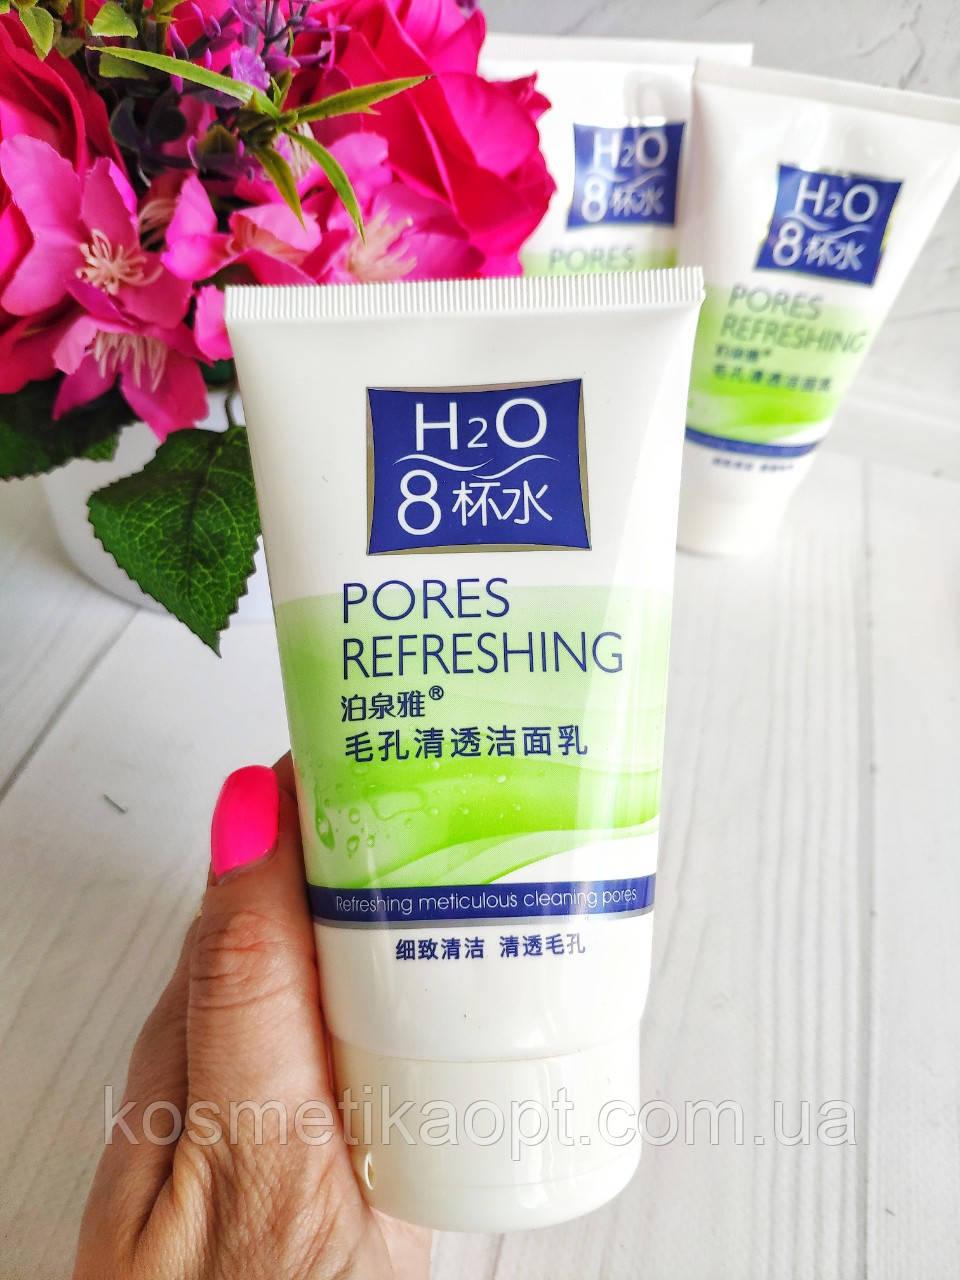 Пенка для очистки пор BioAqua H2O Pores Refreshing